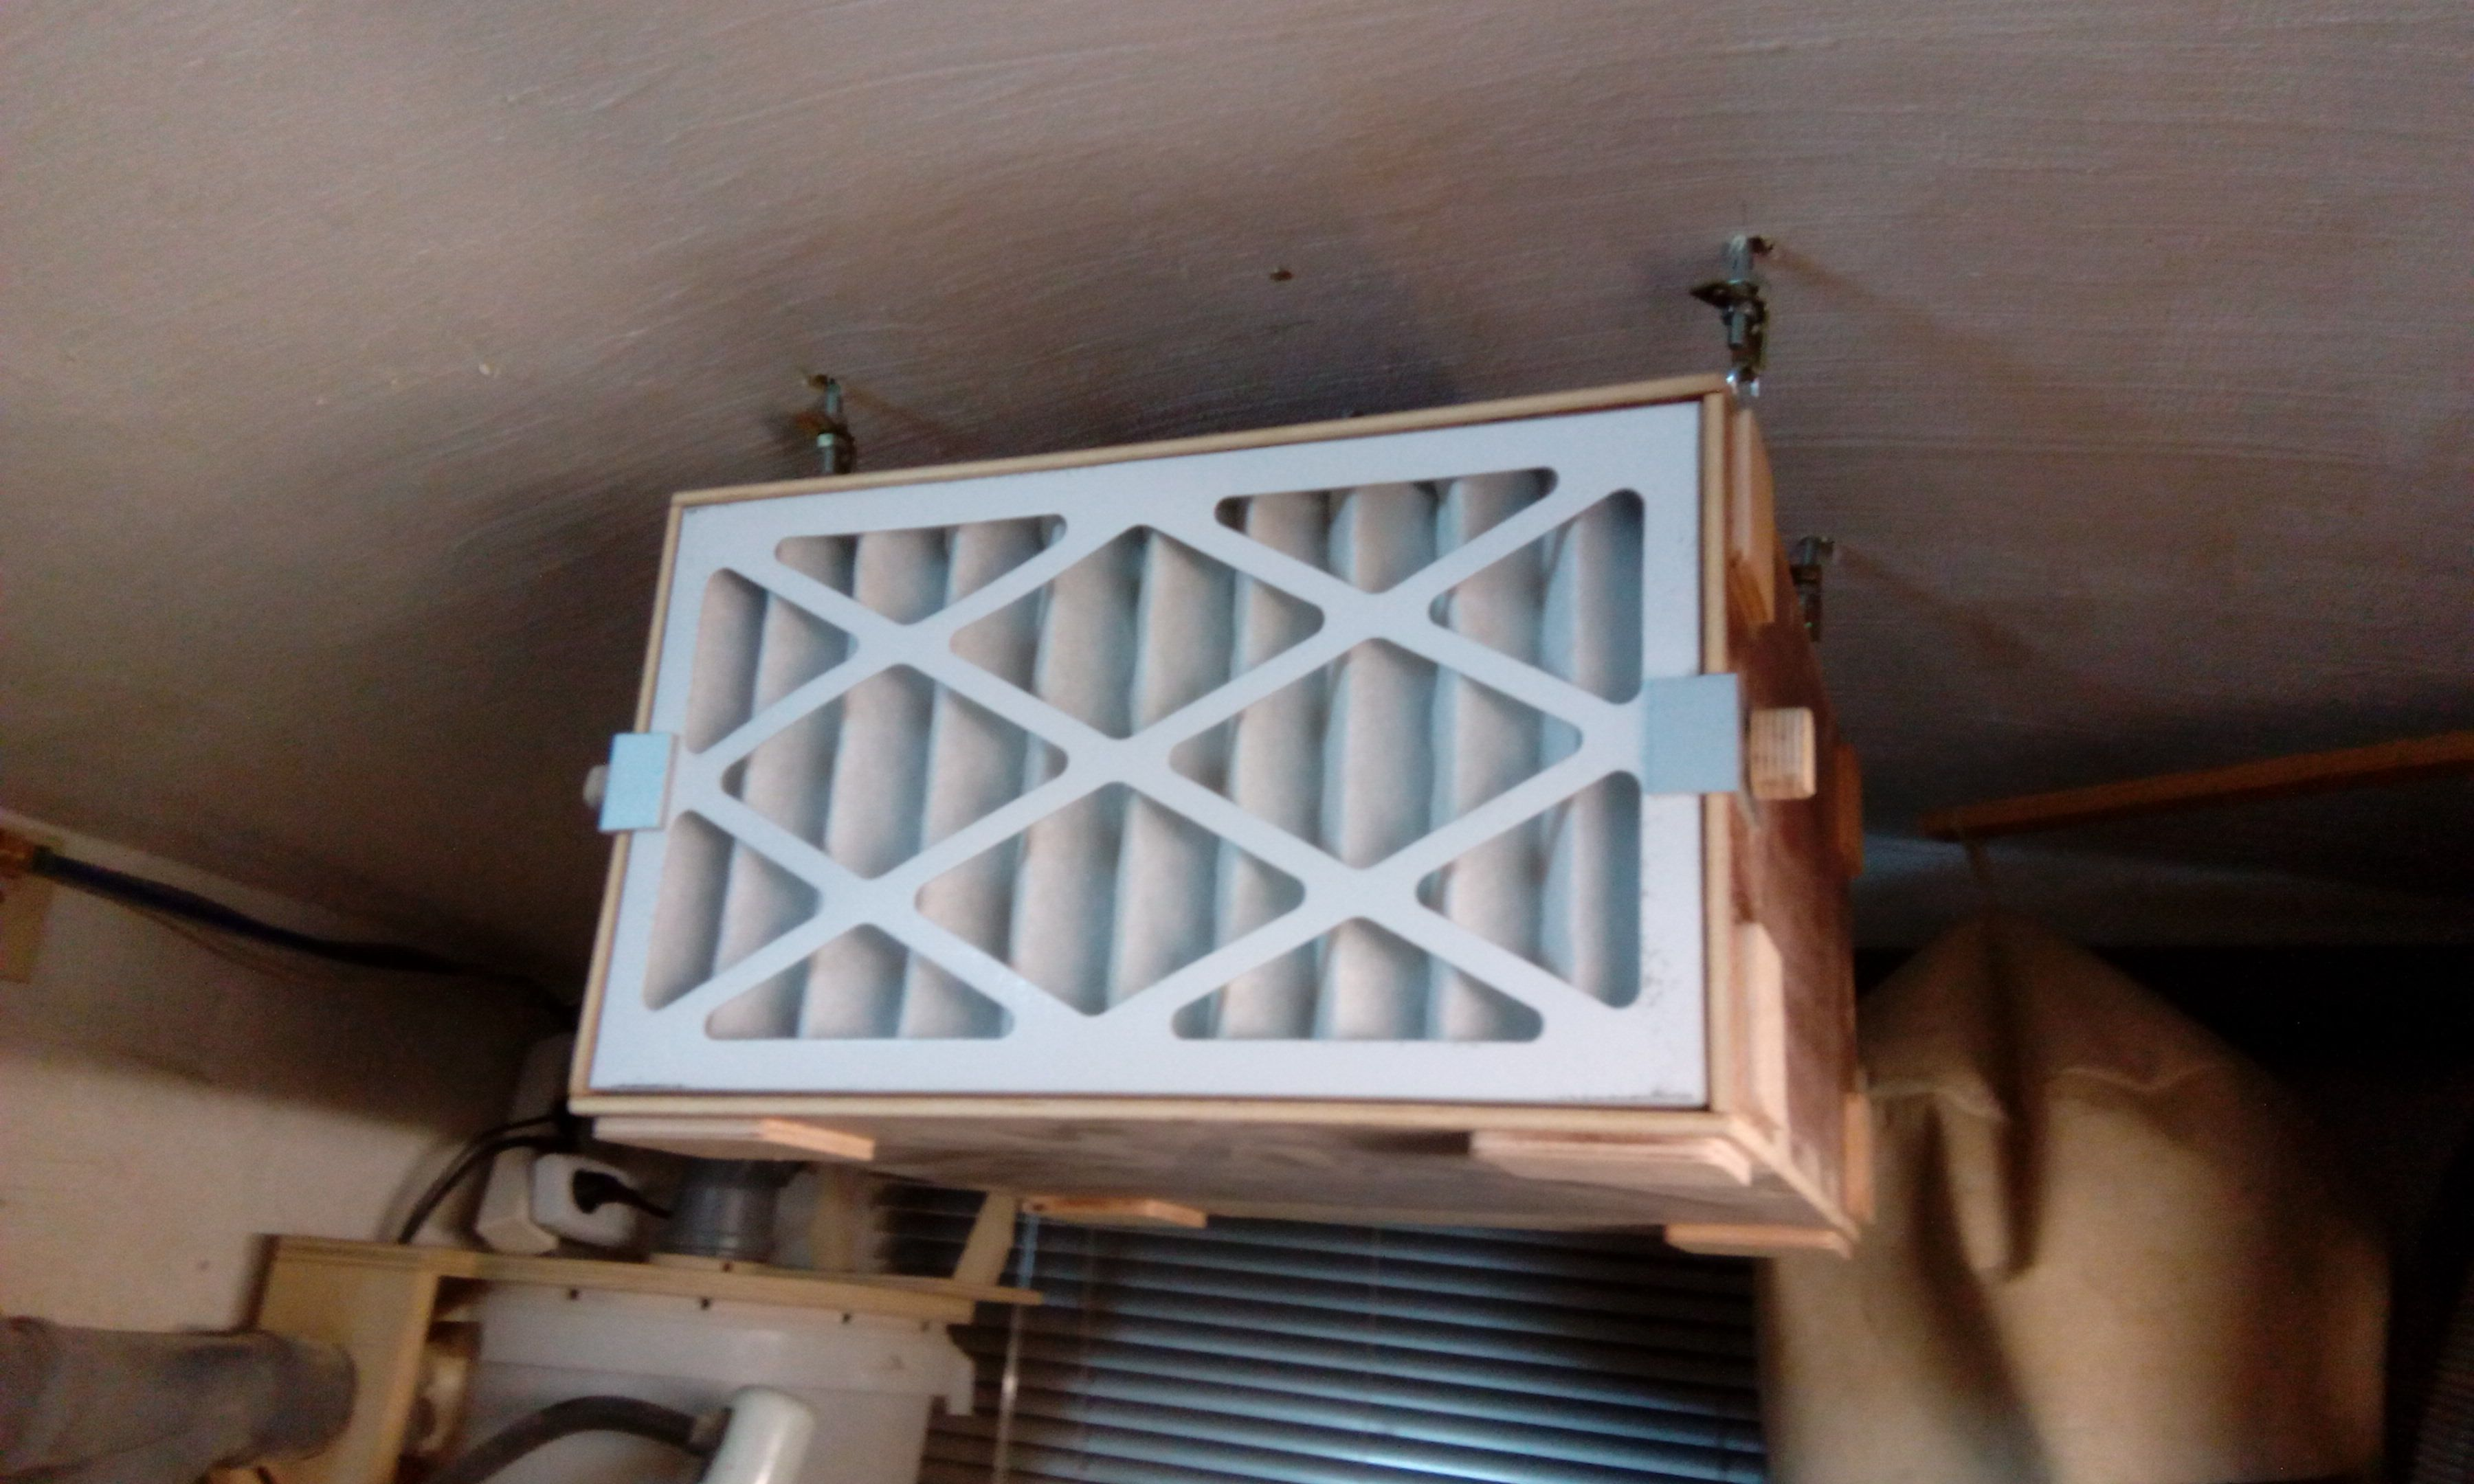 air cleaner luftfiltersystem bauanleitung zum selber bauen troppy s projekte. Black Bedroom Furniture Sets. Home Design Ideas